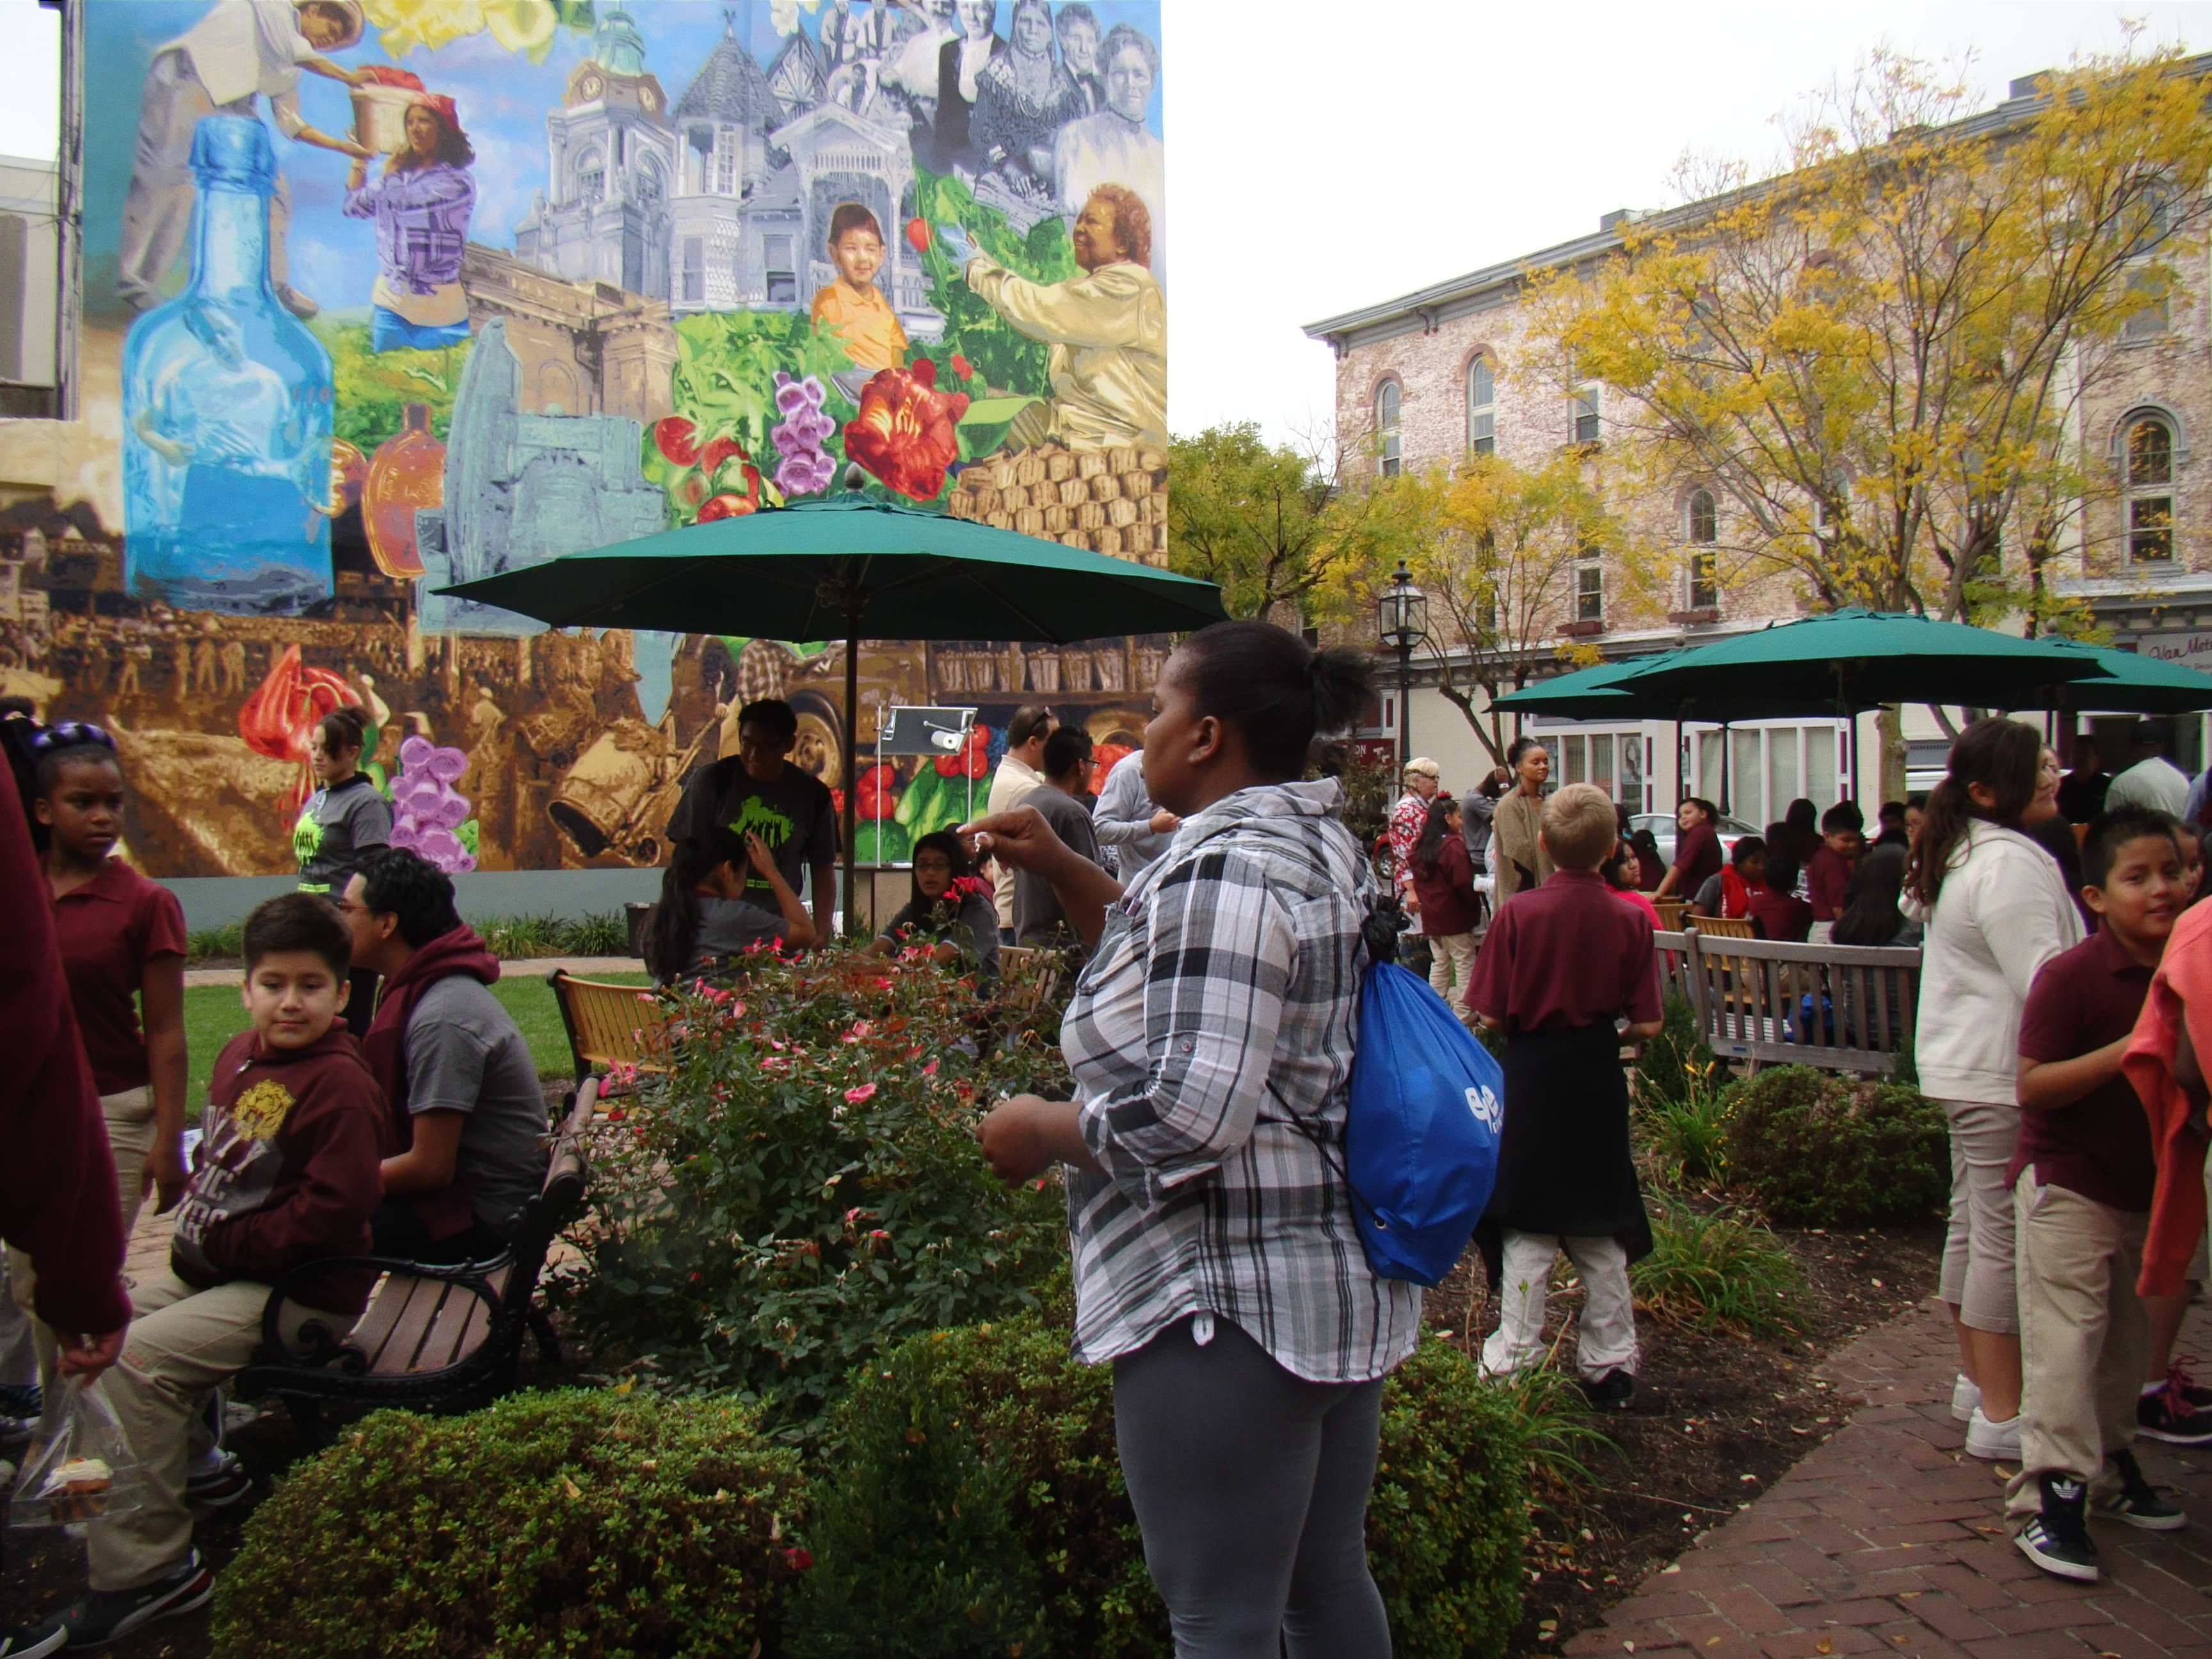 Downtown's pocket park